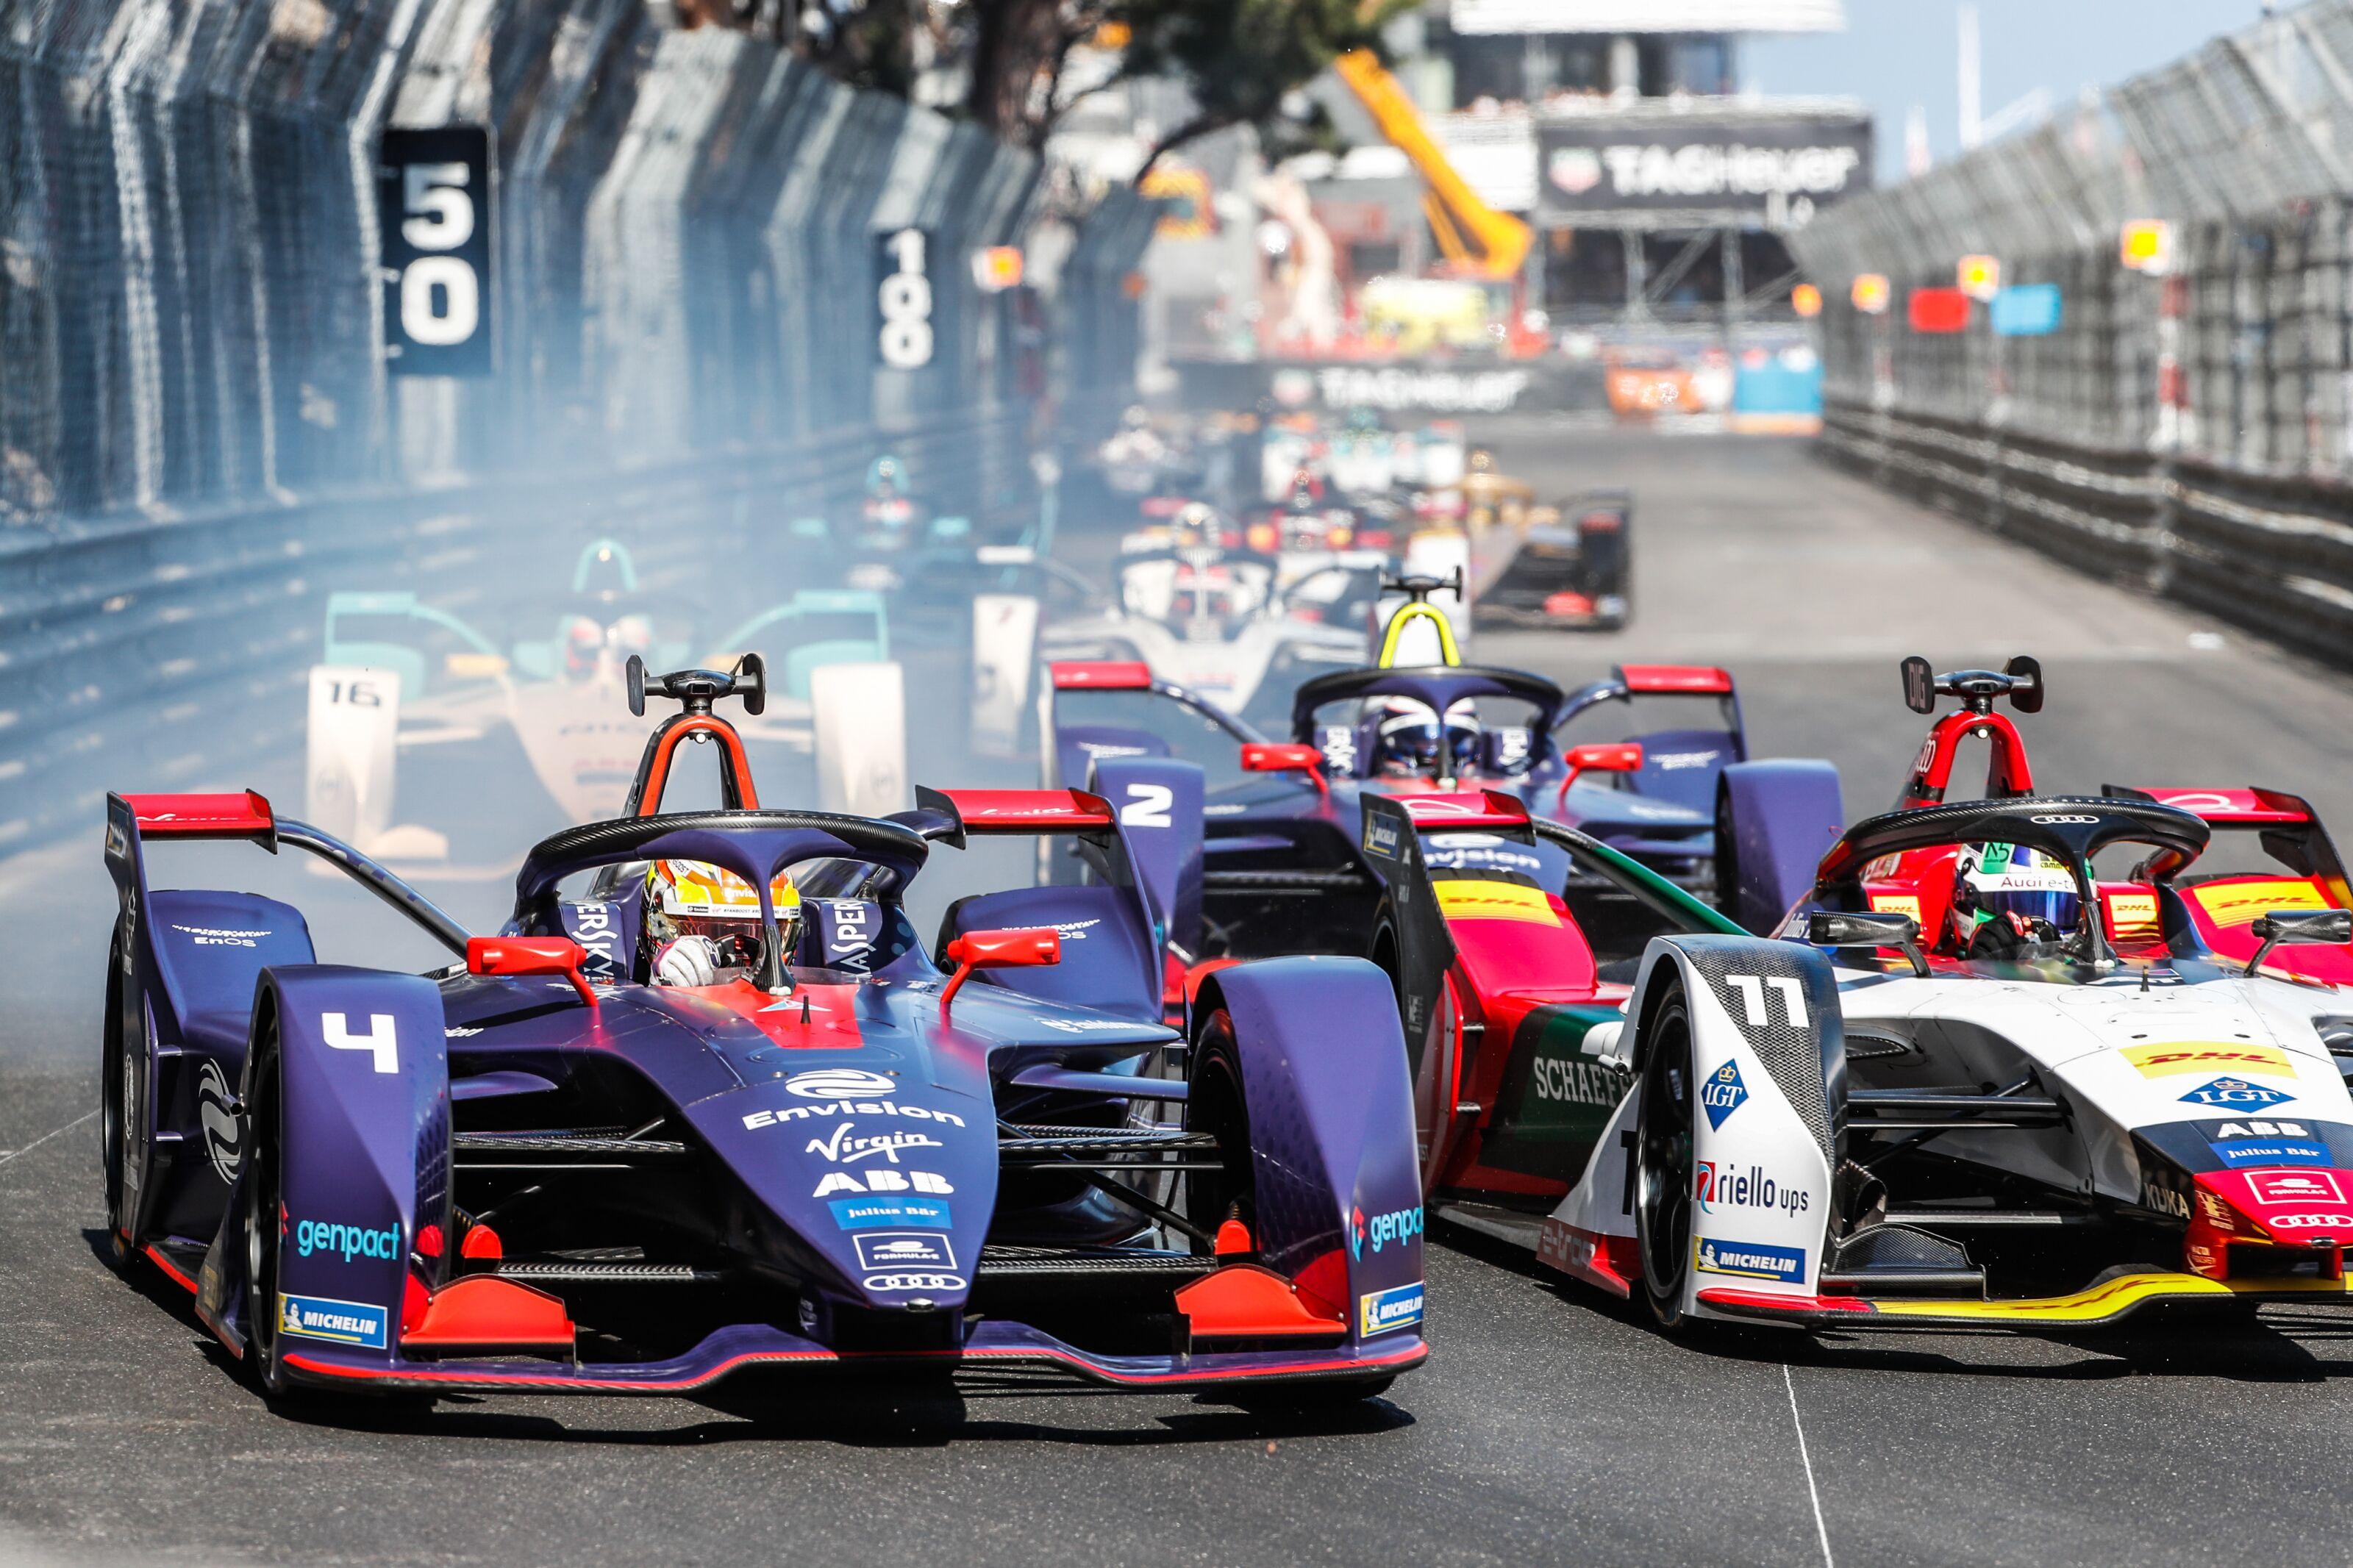 Formula E Driver Power Rankings after 2019 Berlin ePrix